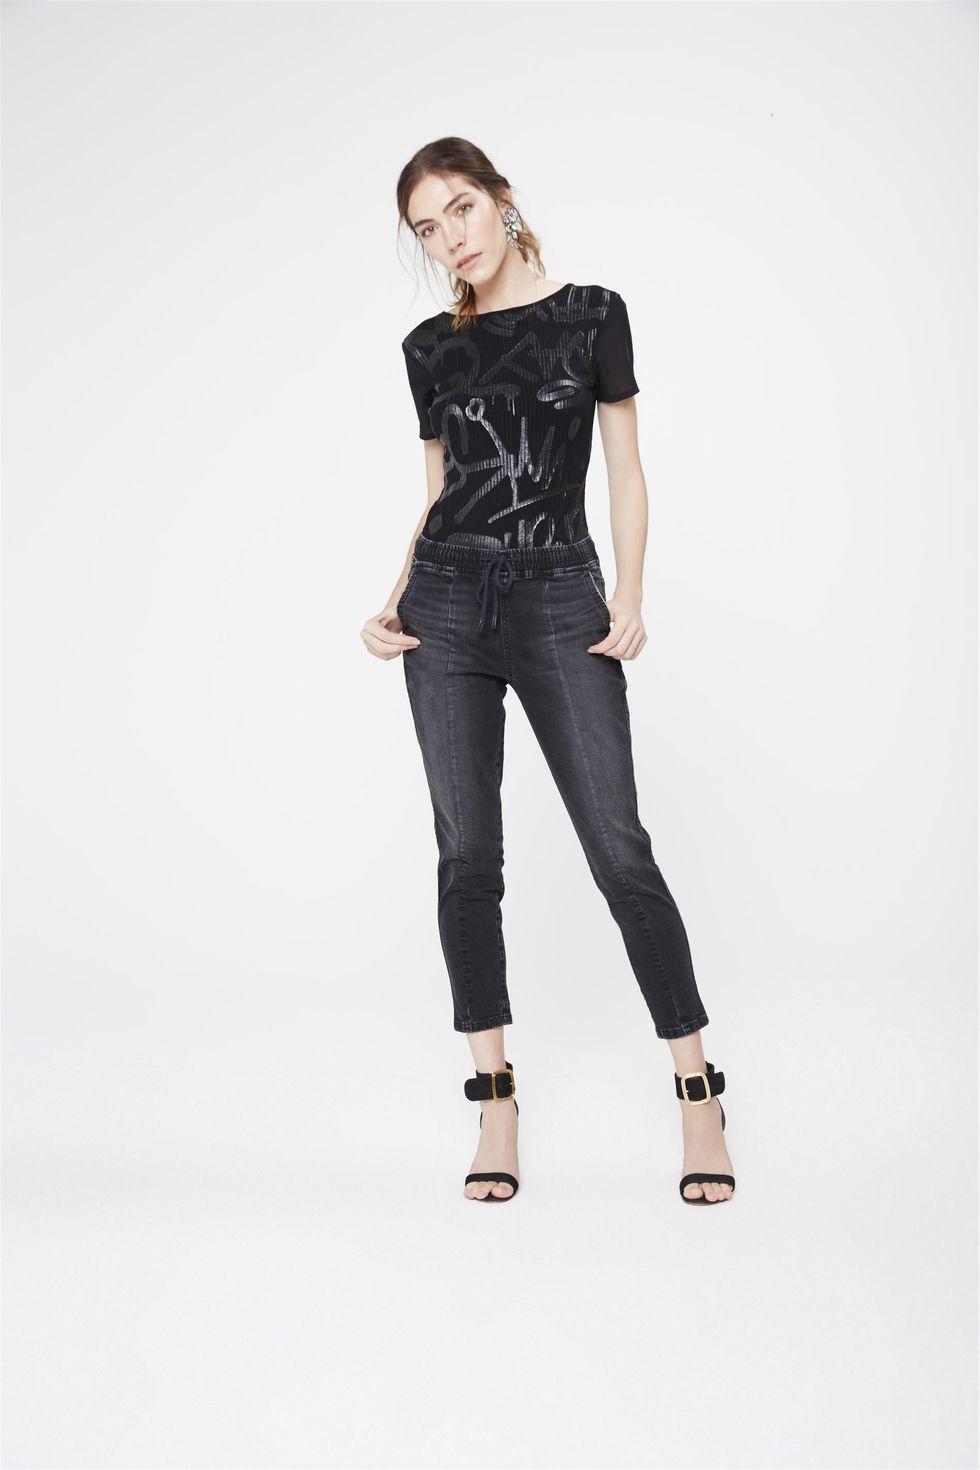 Calca-Jogger-Jeans-Preta-Feminina-Frente--